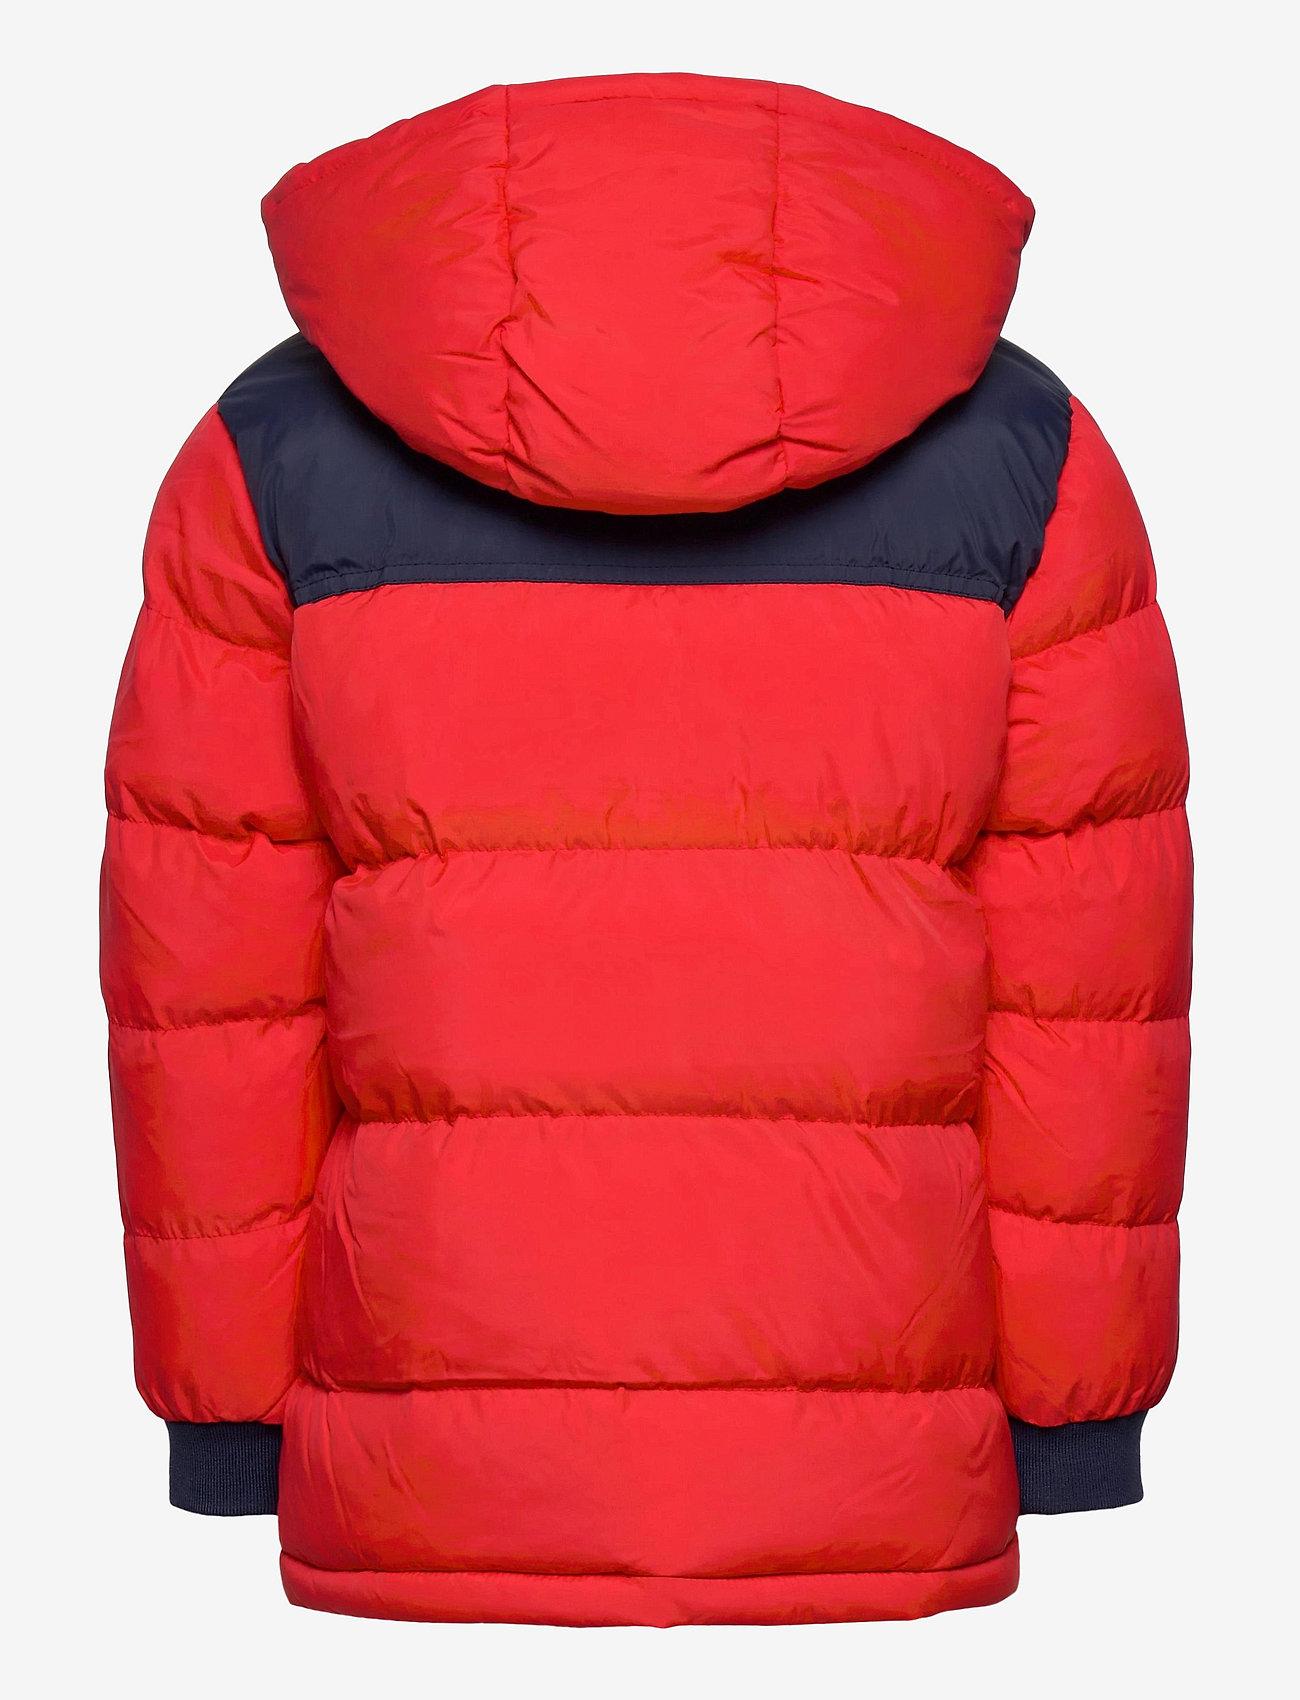 Timberland - PUFFER JACKET - dunjakker & forede jakker - bright red - 1